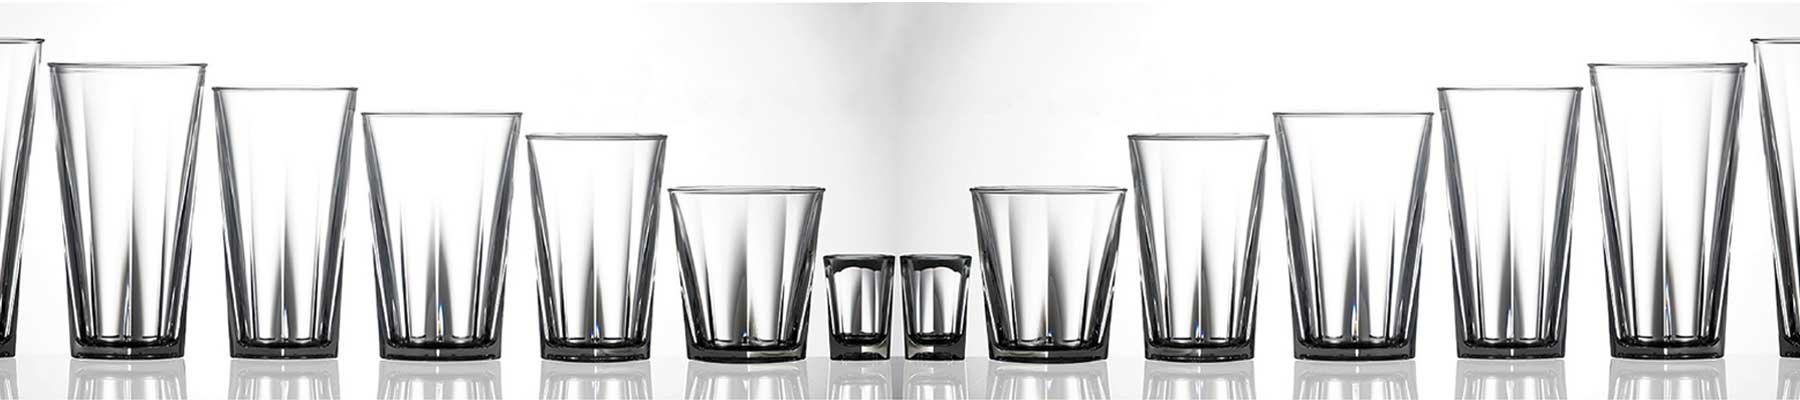 tumblers-glassware